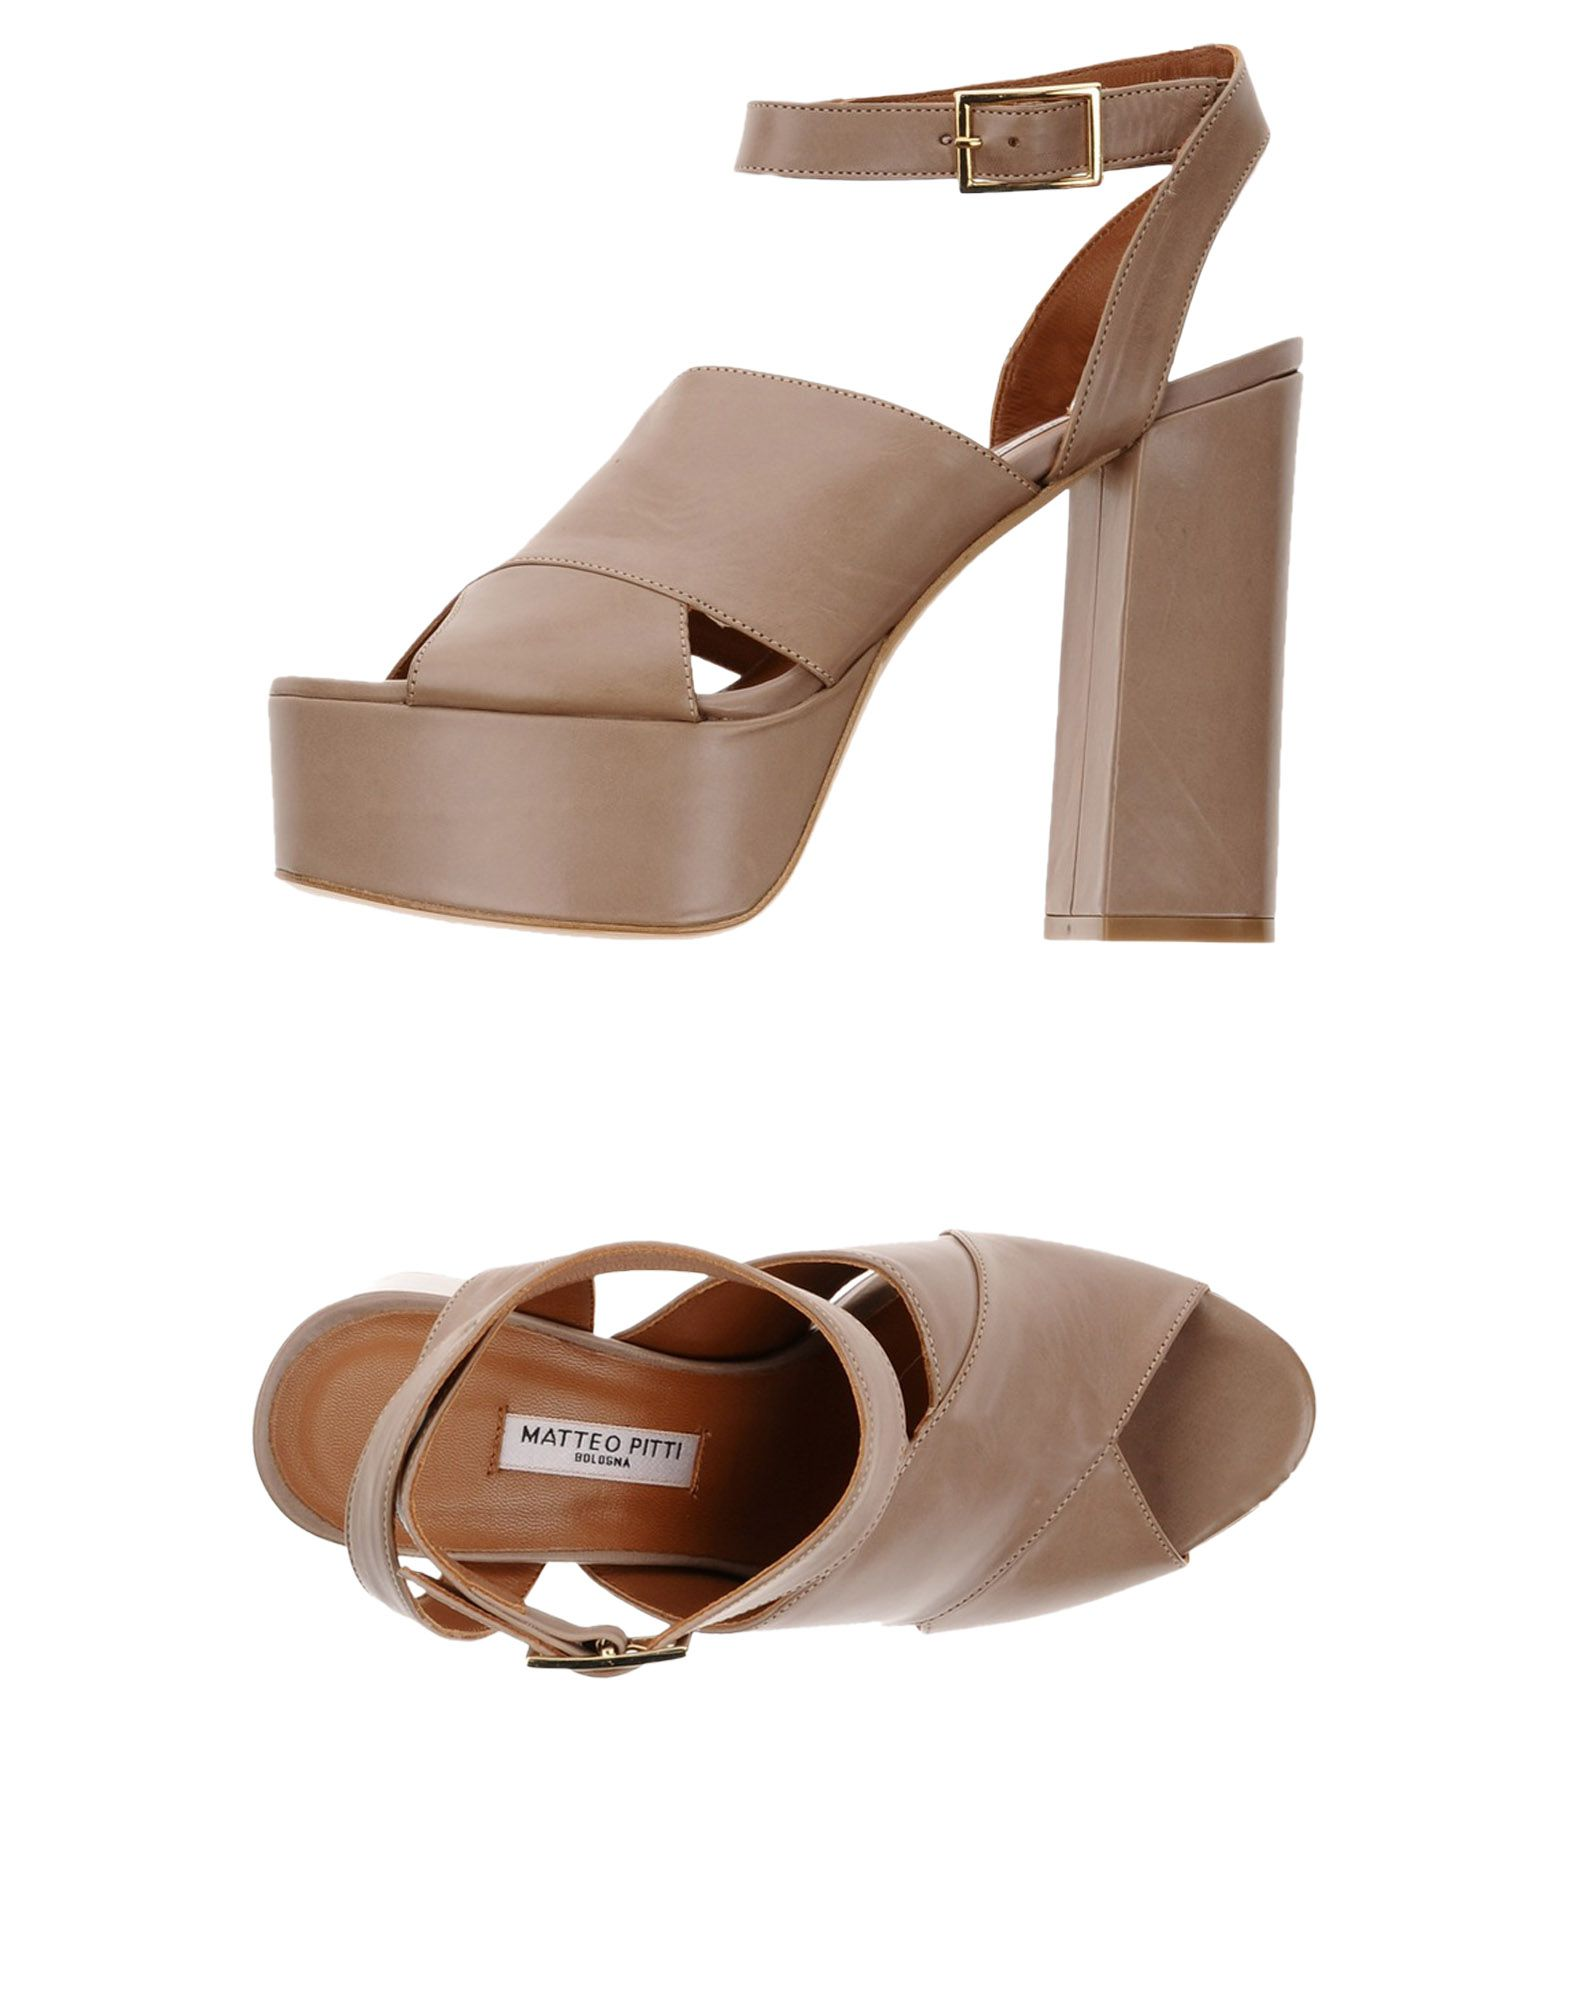 Matteo Pitti Bologna Sandalen Damen Damen Damen  11374552WV Neue Schuhe 719498